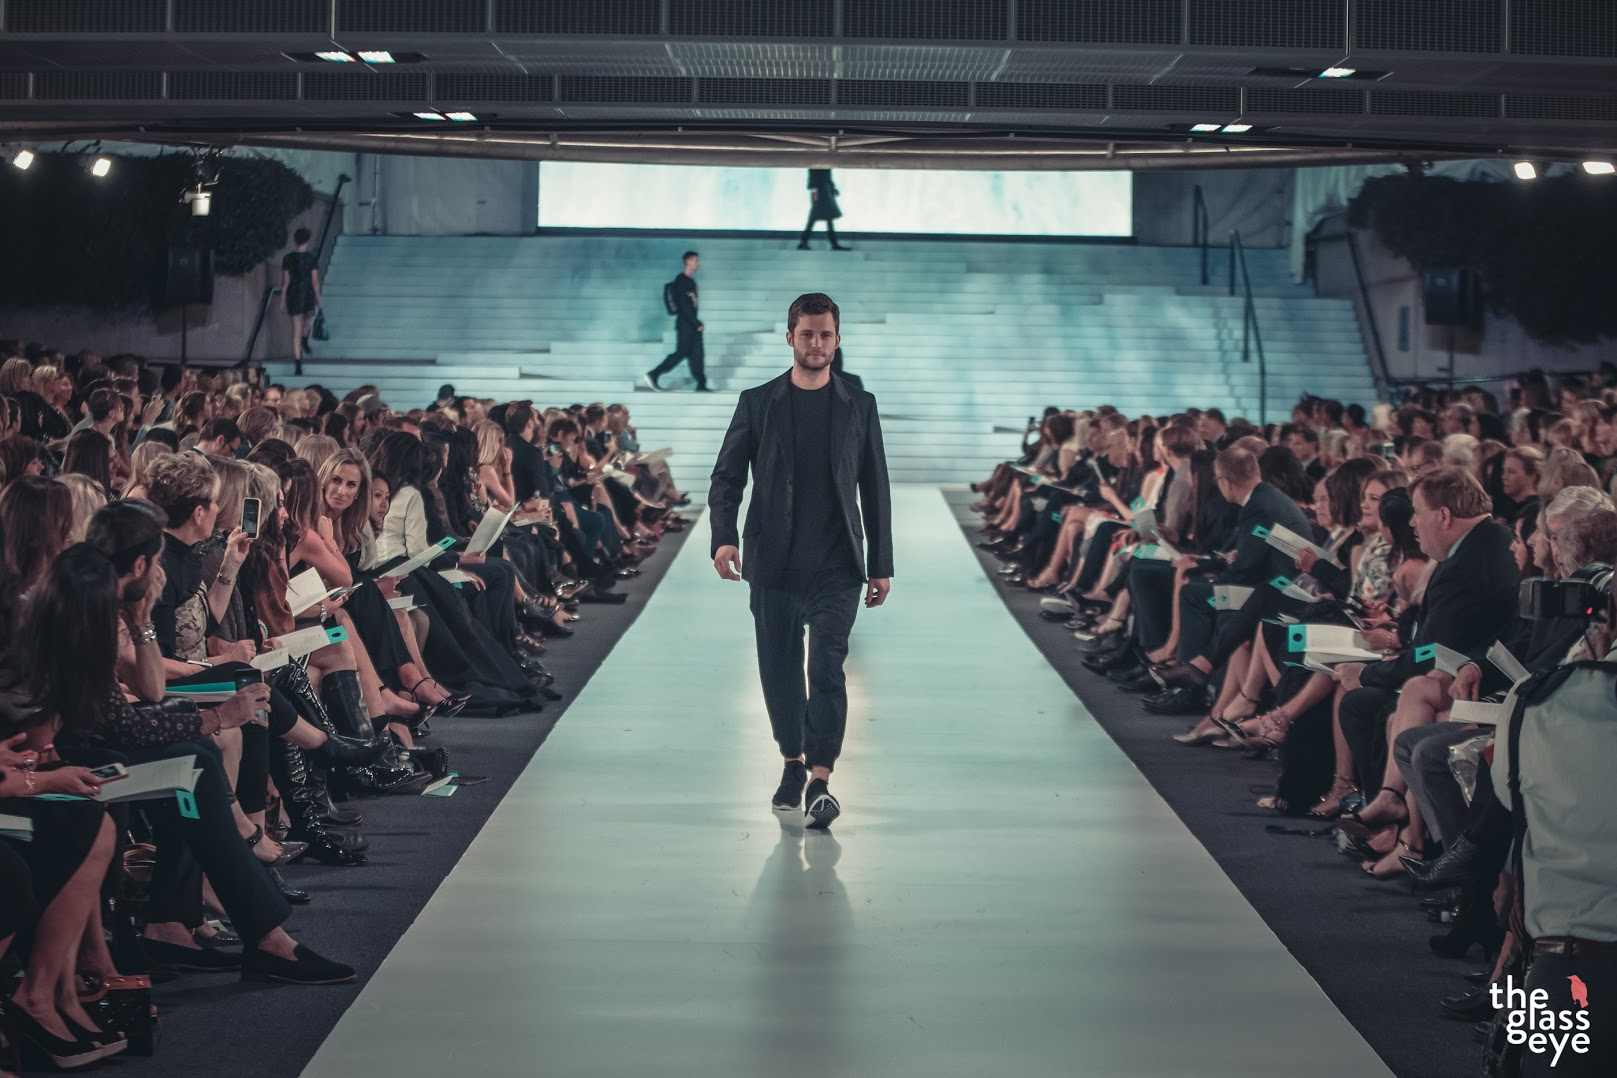 TGE_Nordstrom_FashionShow_VCB-023